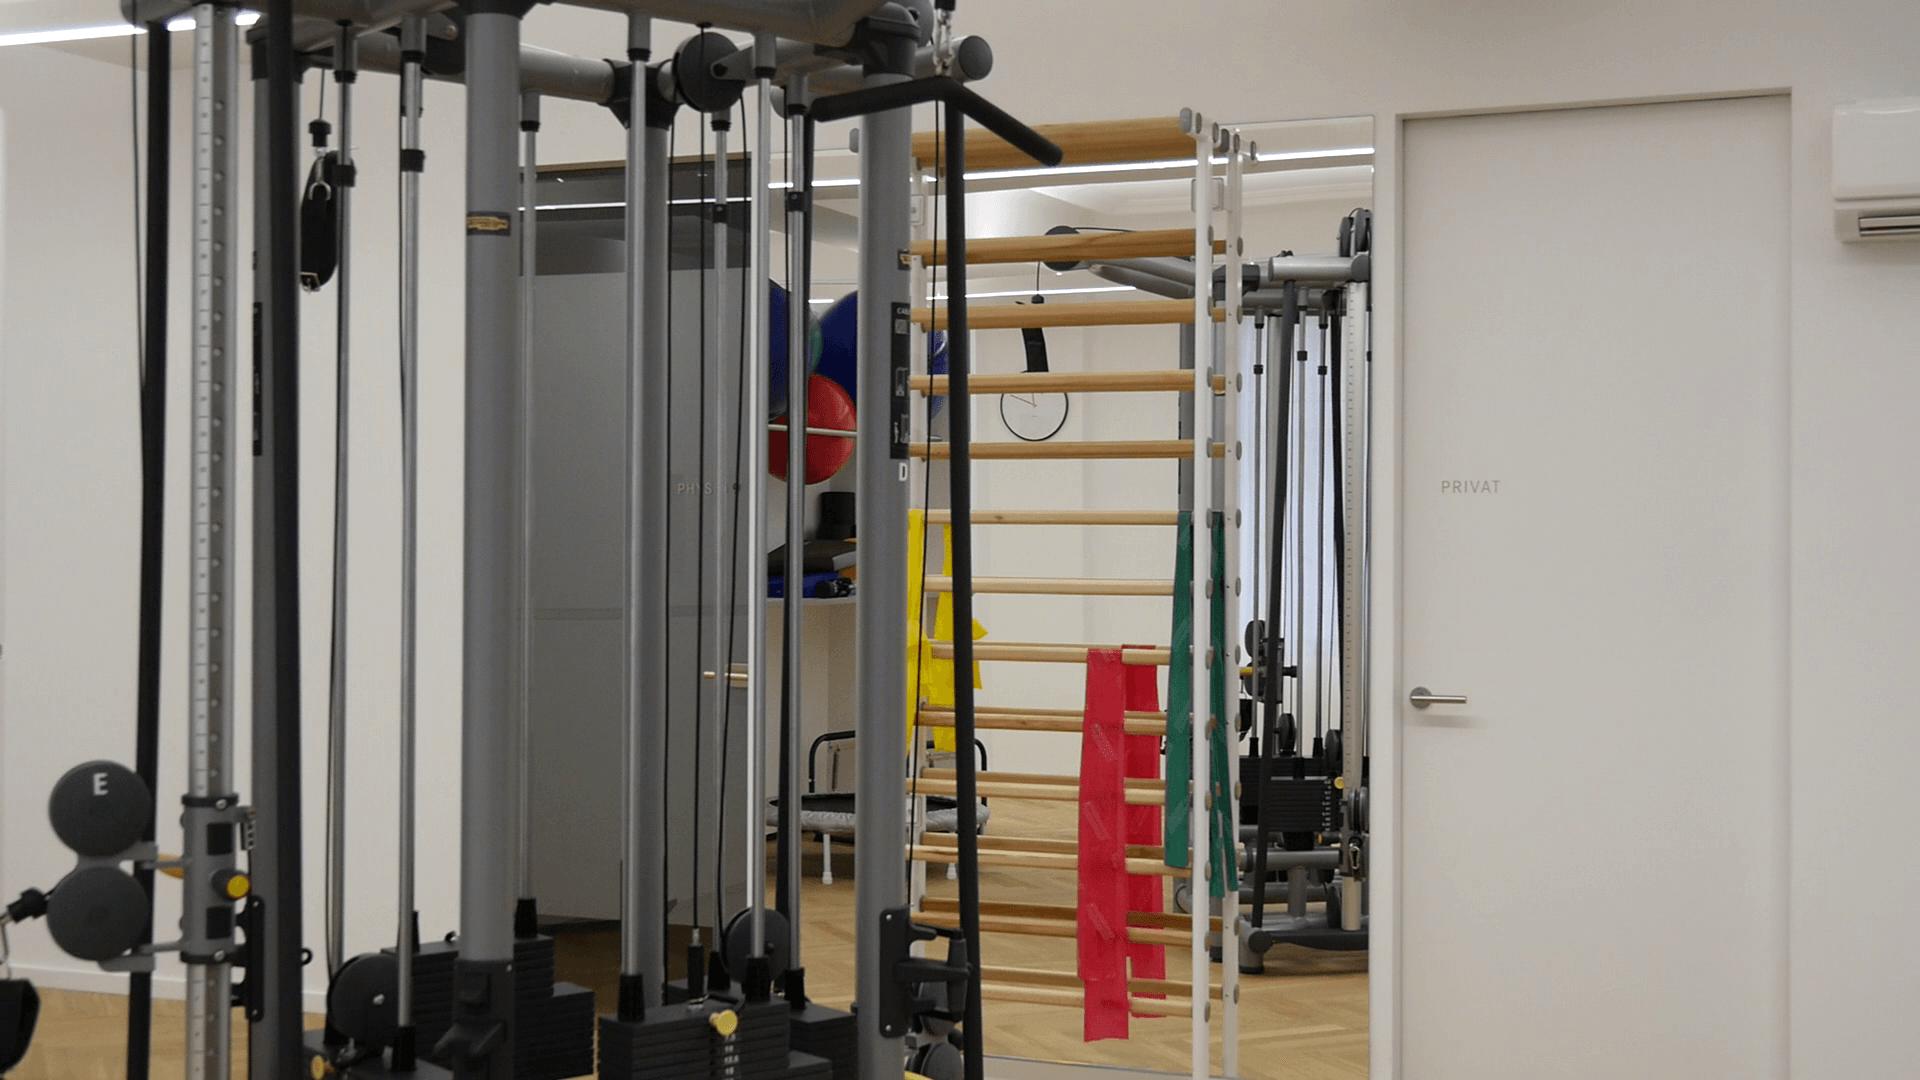 Raumplanung im Praxiswesen bei Physiozentrum